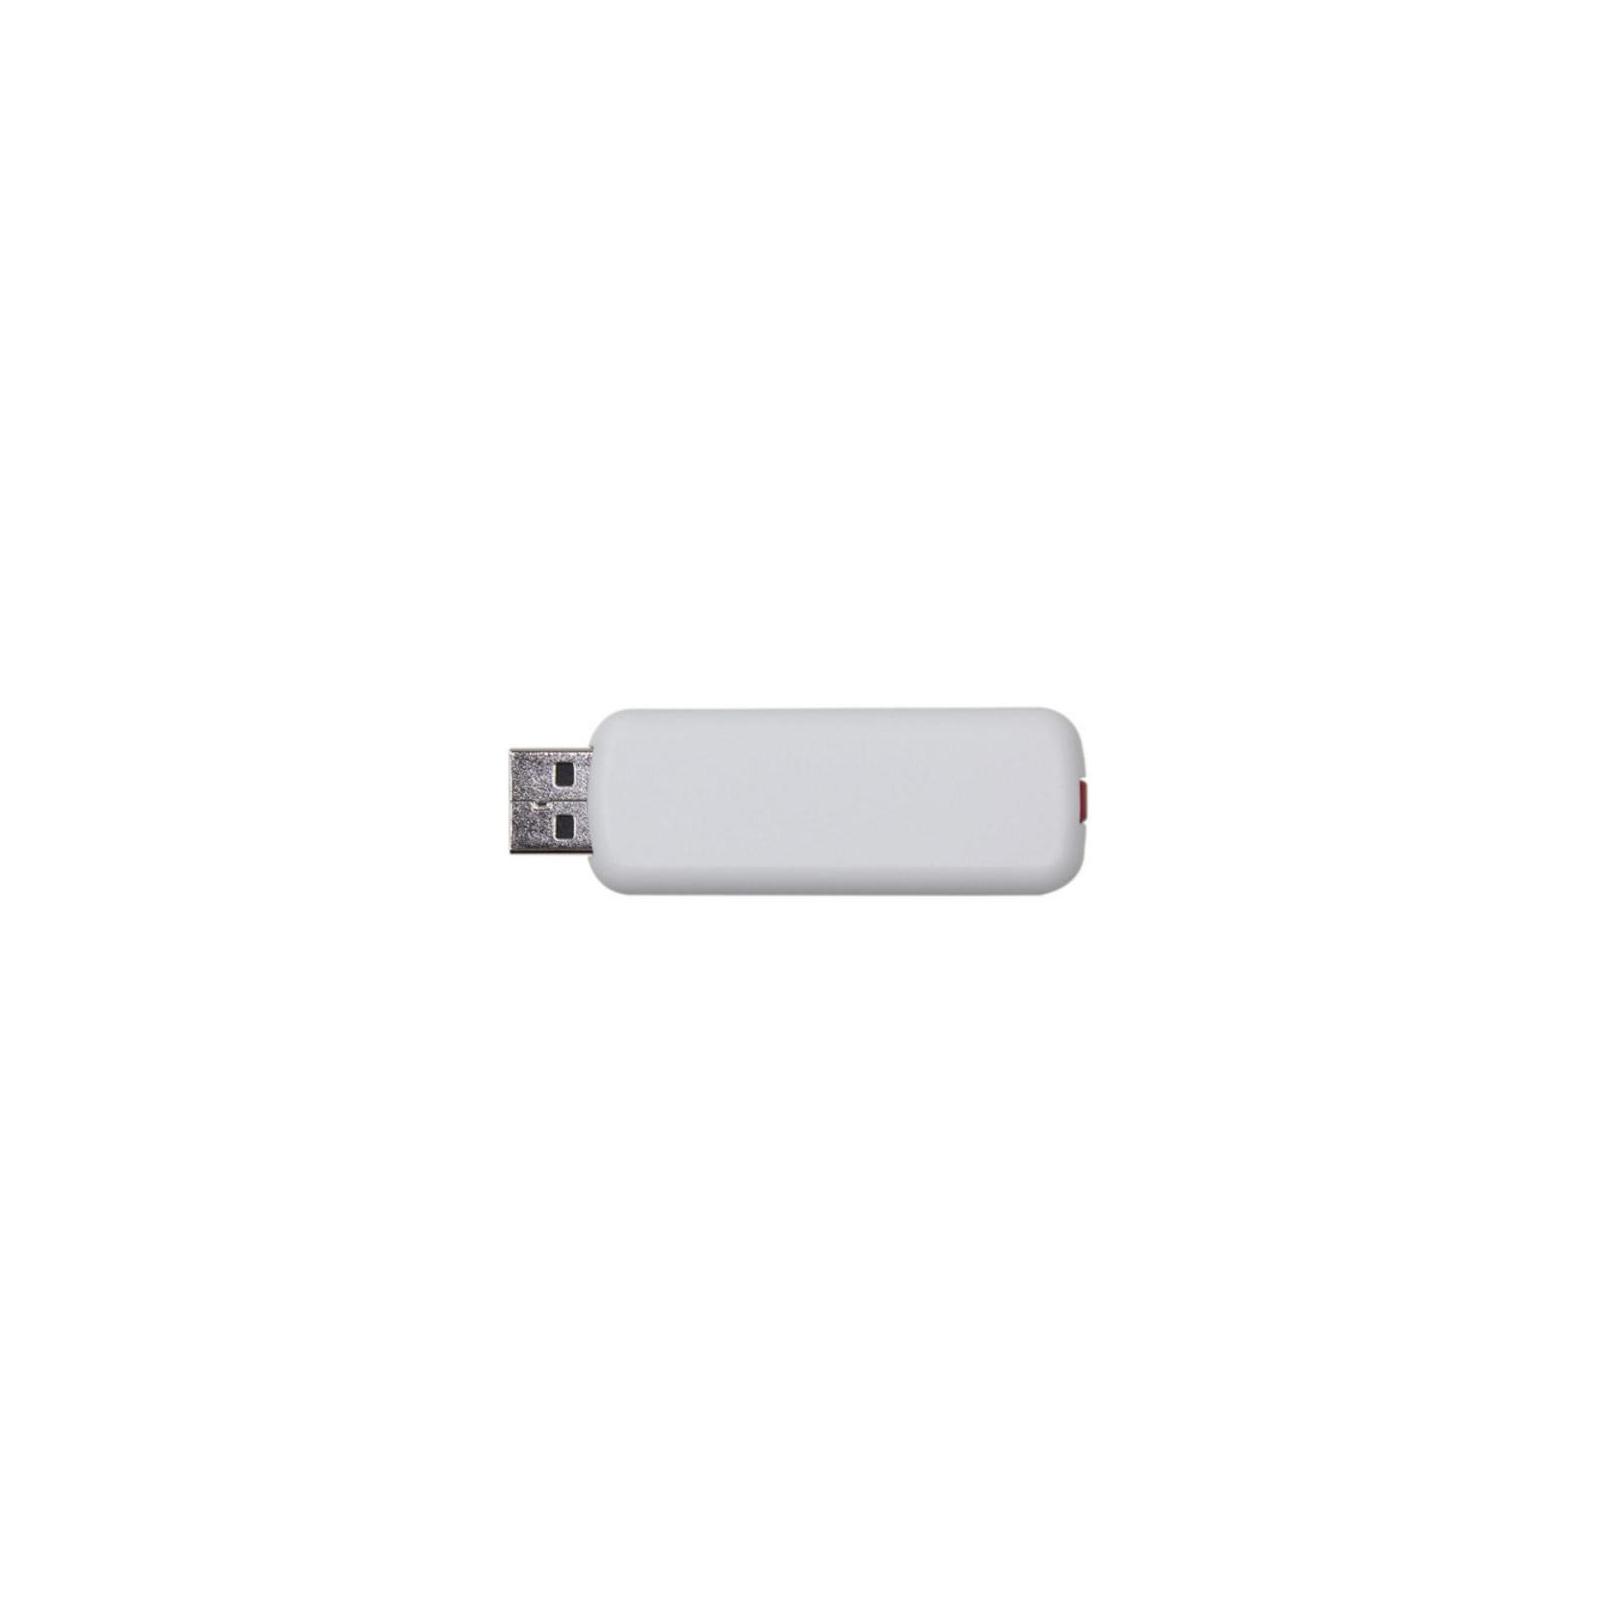 USB флеш накопитель Handy Steno AH326 white Apacer (AP16GAH326W-1) изображение 2